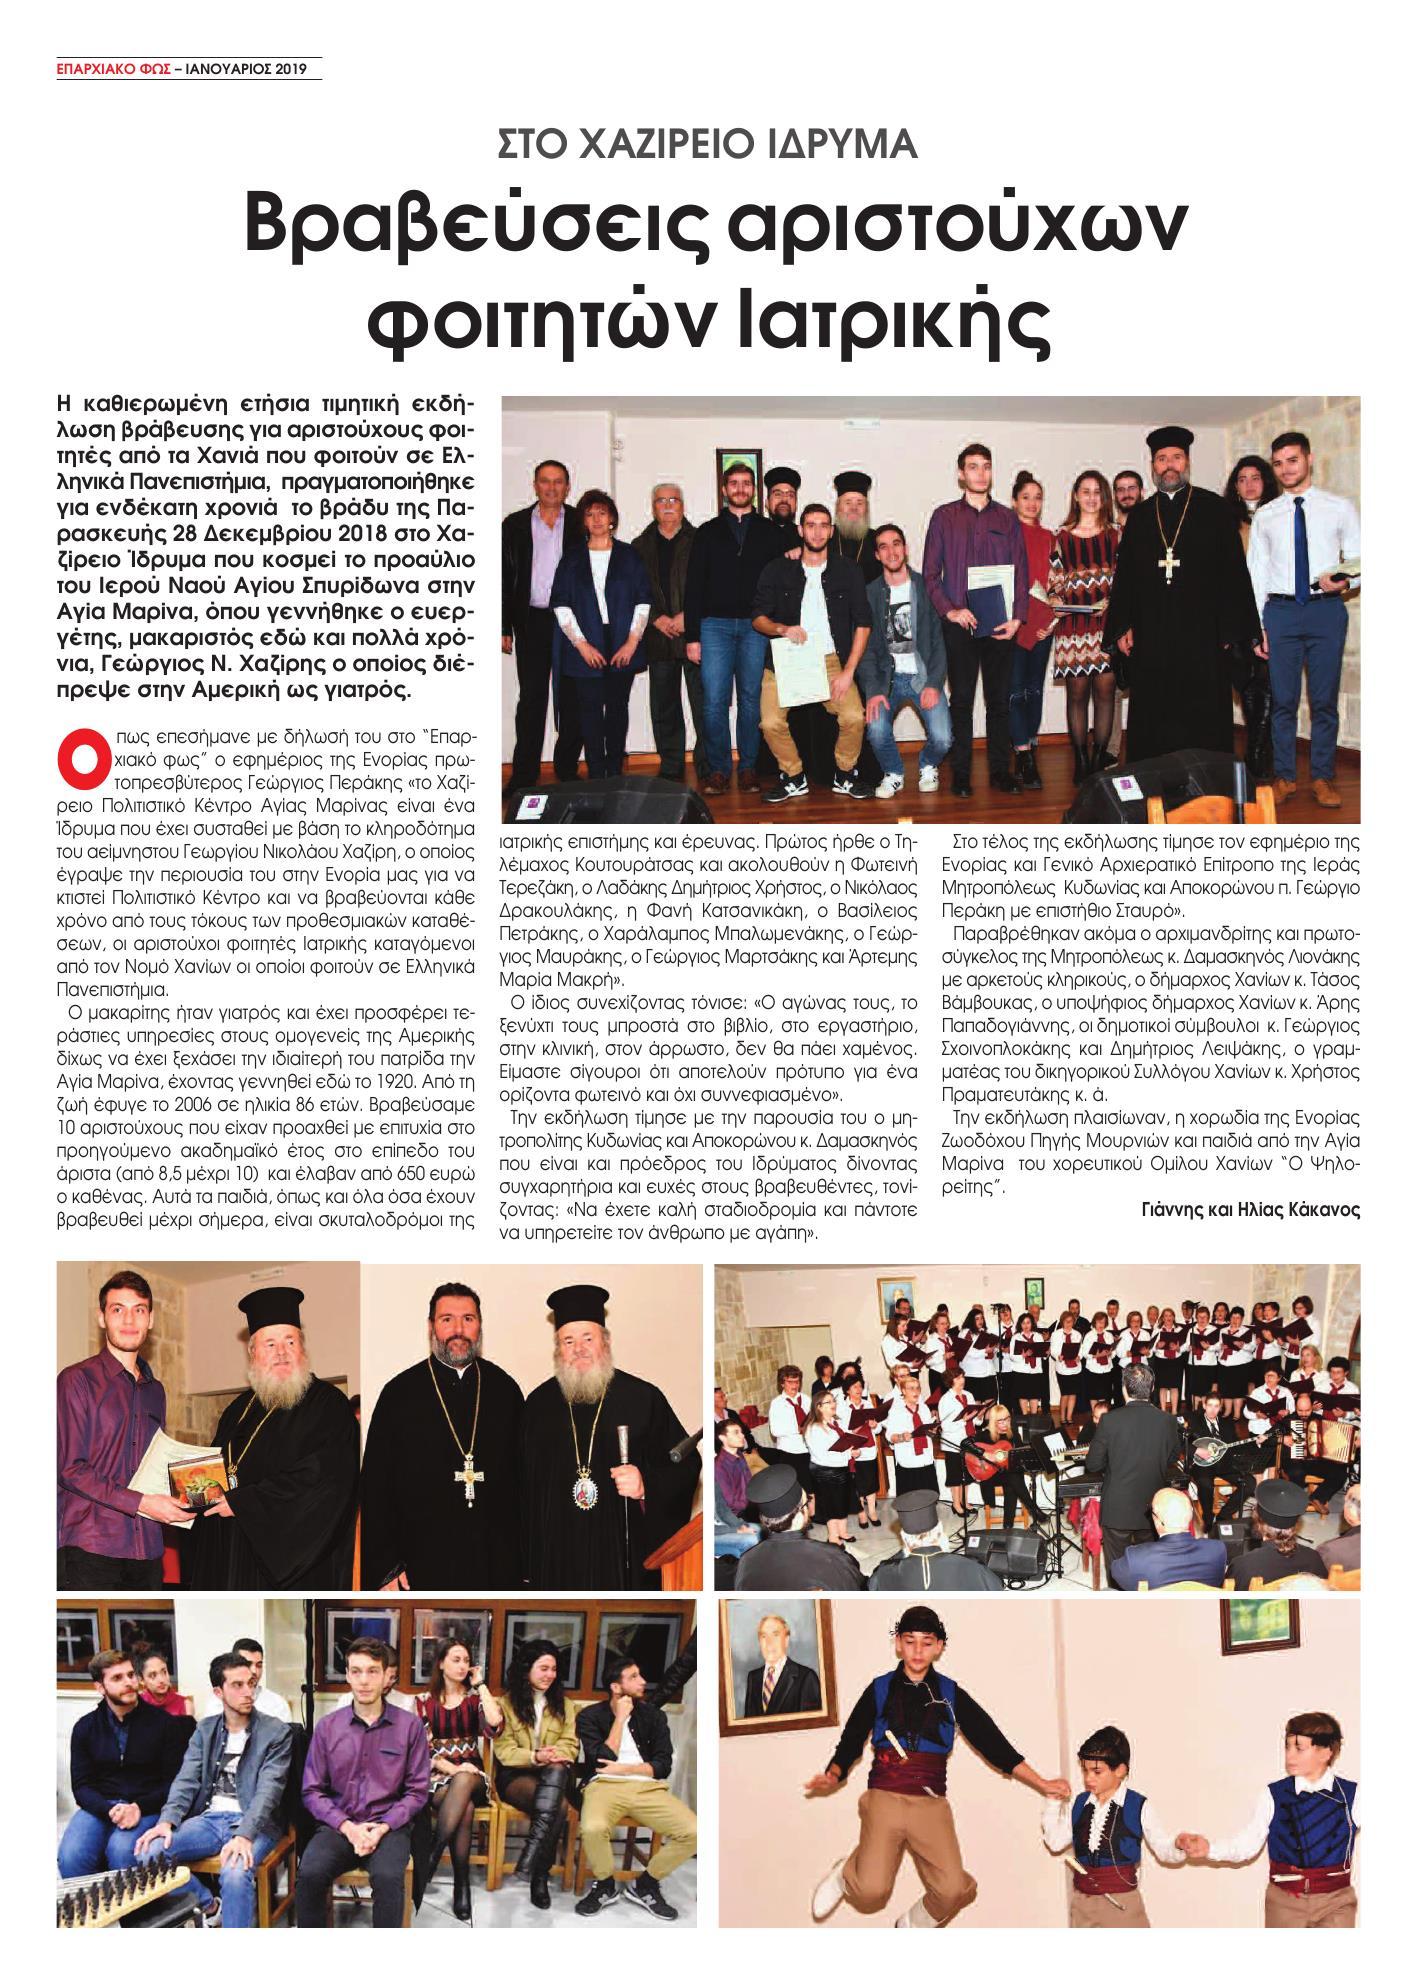 23 KAKANOULHS (Page 24)